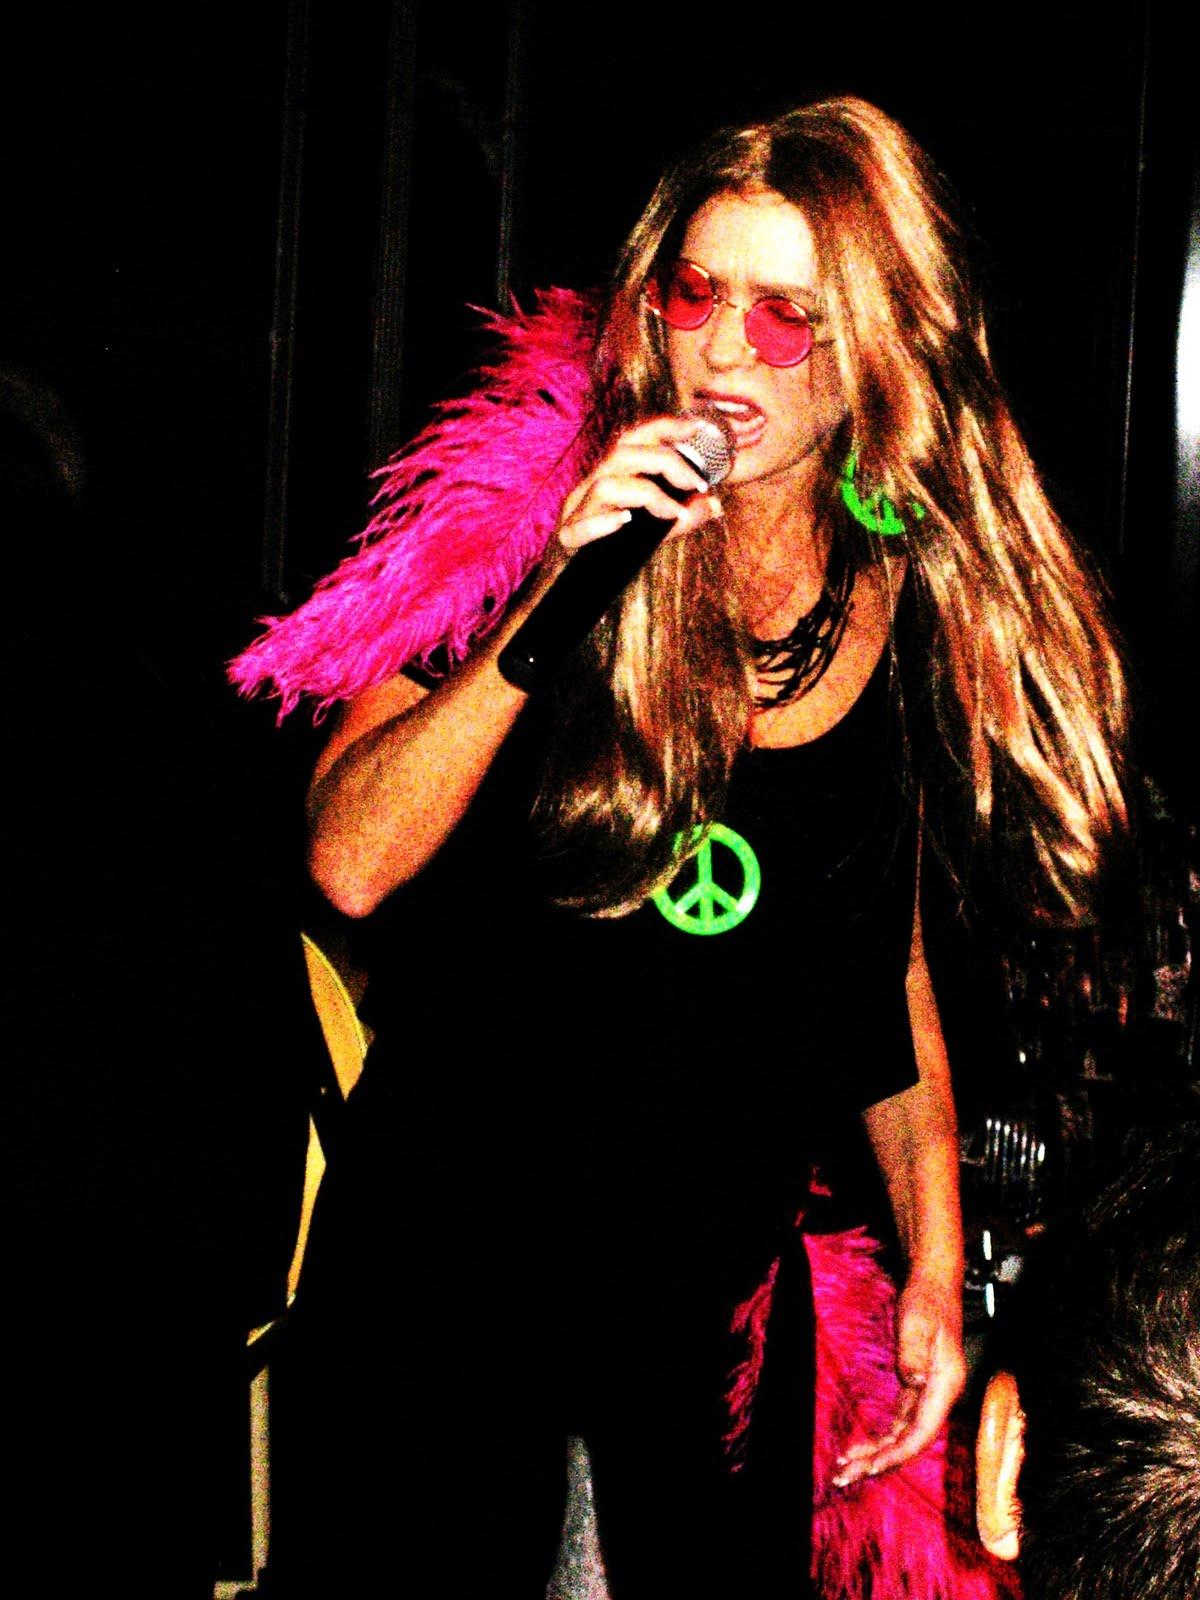 http://2.bp.blogspot.com/_8nYbd_HLh2s/TEtQtfADopI/AAAAAAAACSo/oNrBvL4Htm0/s1600/Groucho+Marx+open+mic+082.JPG